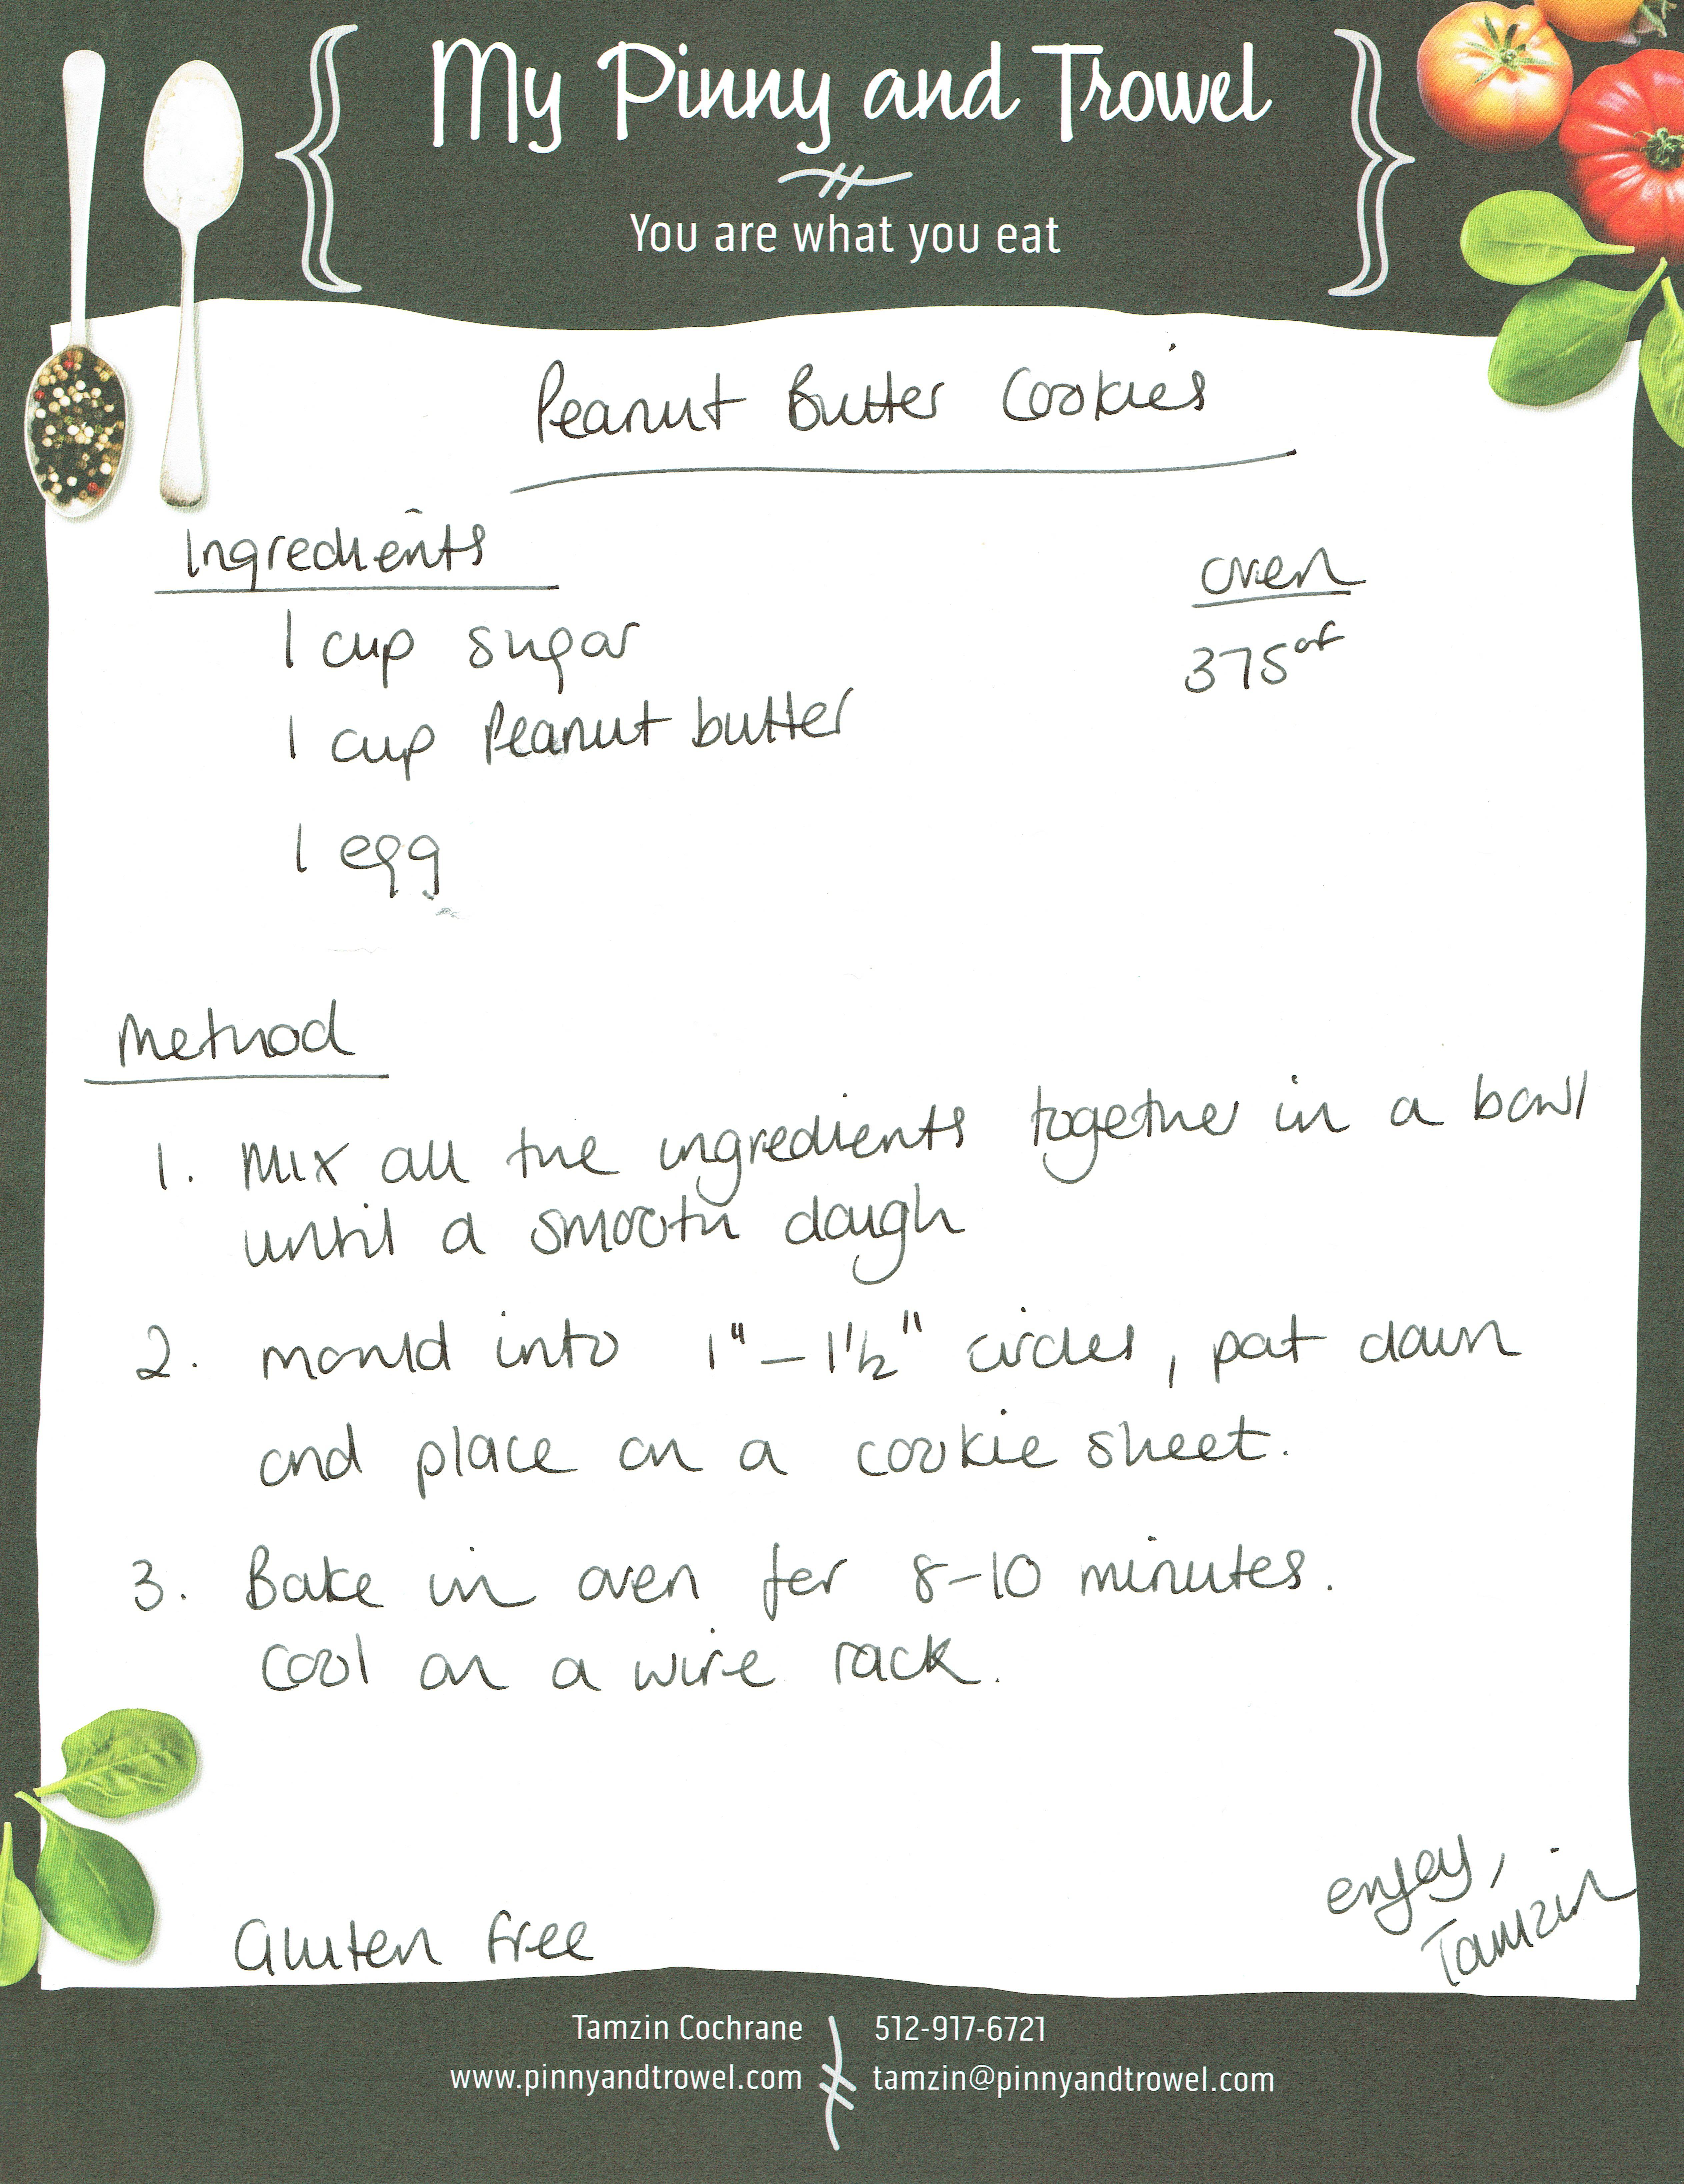 Tamzin Cochrane peanut butter cookie recipe